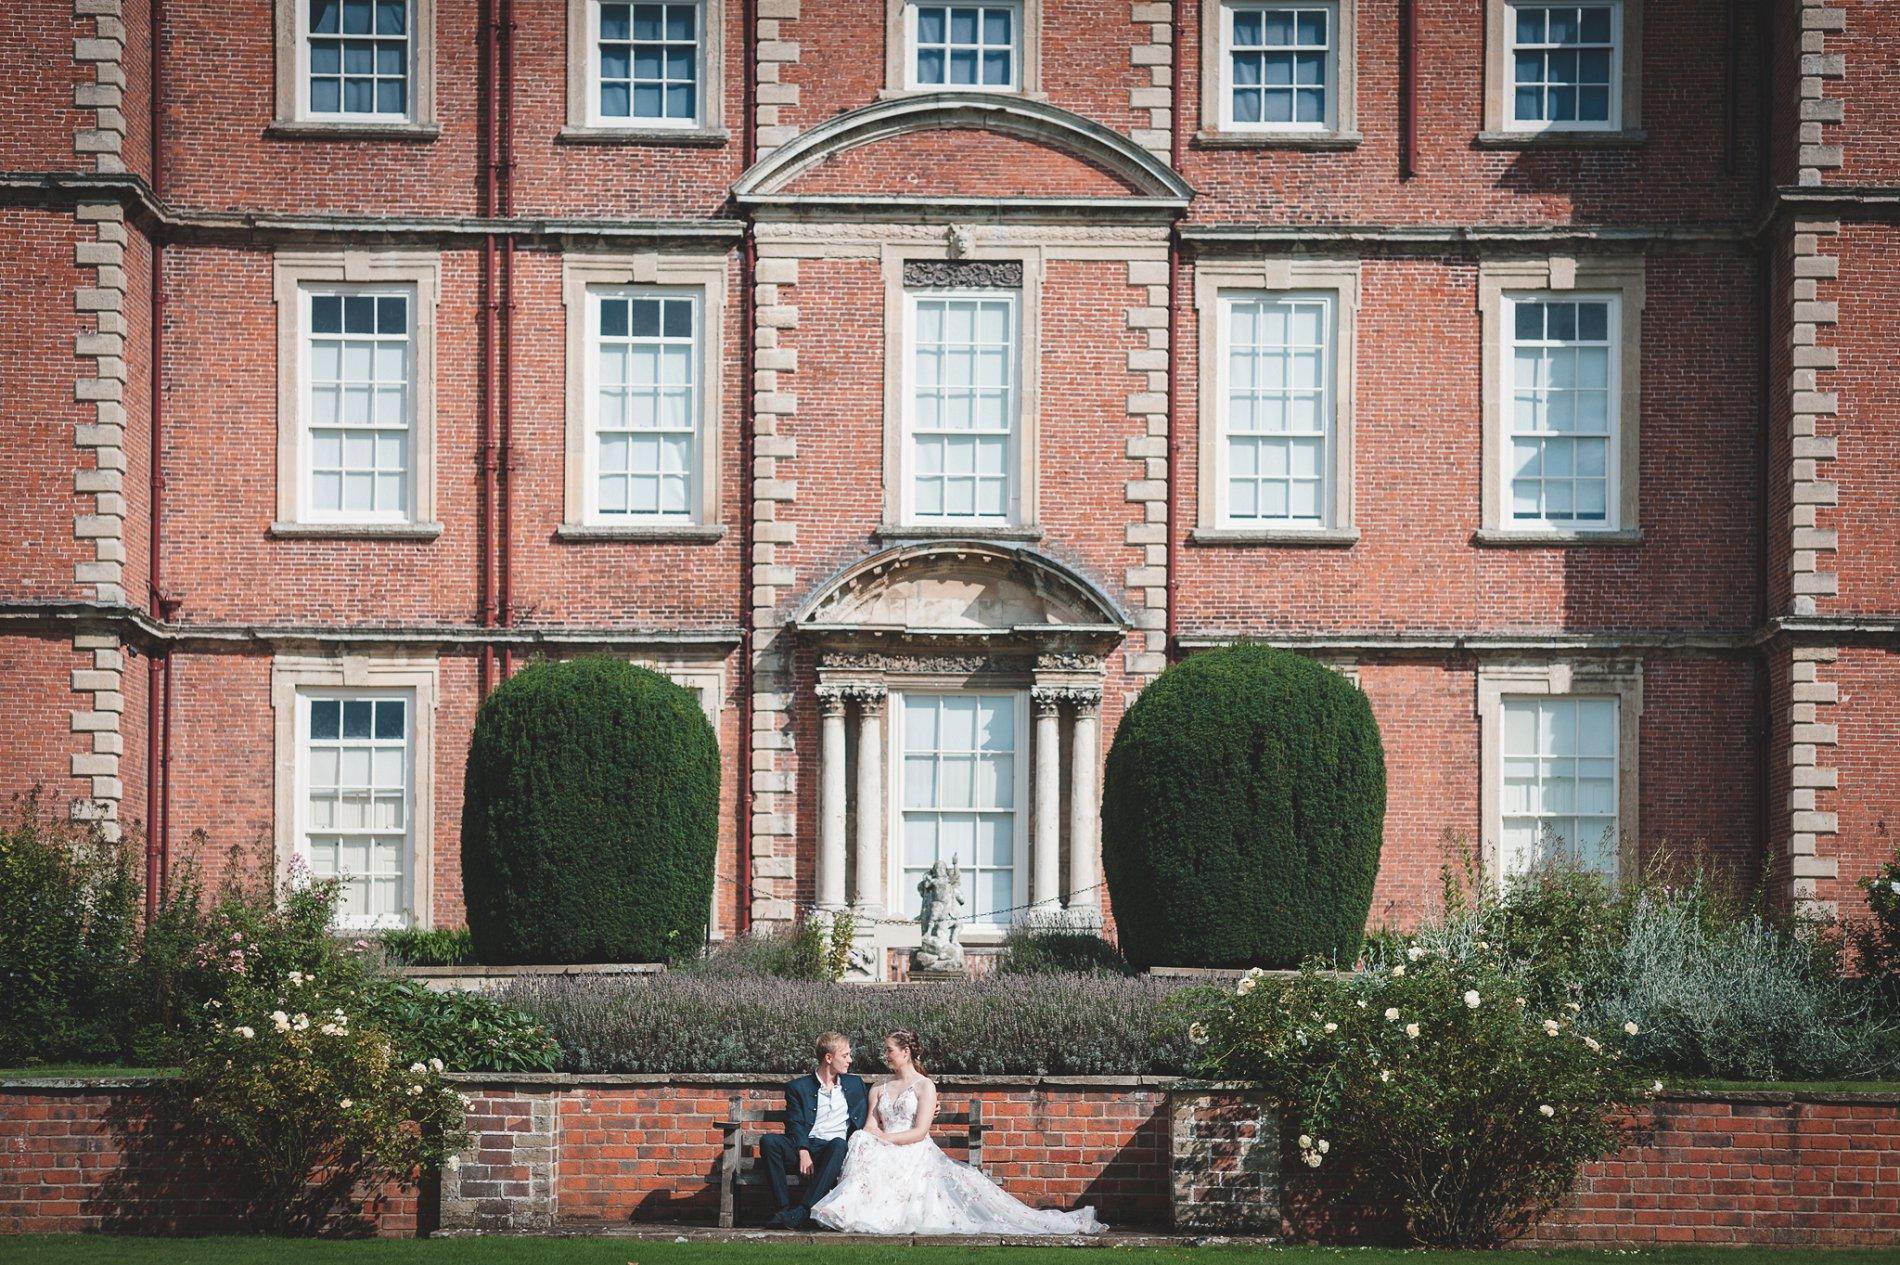 Renaissance Themed Shoot at Newby Hall Orangery